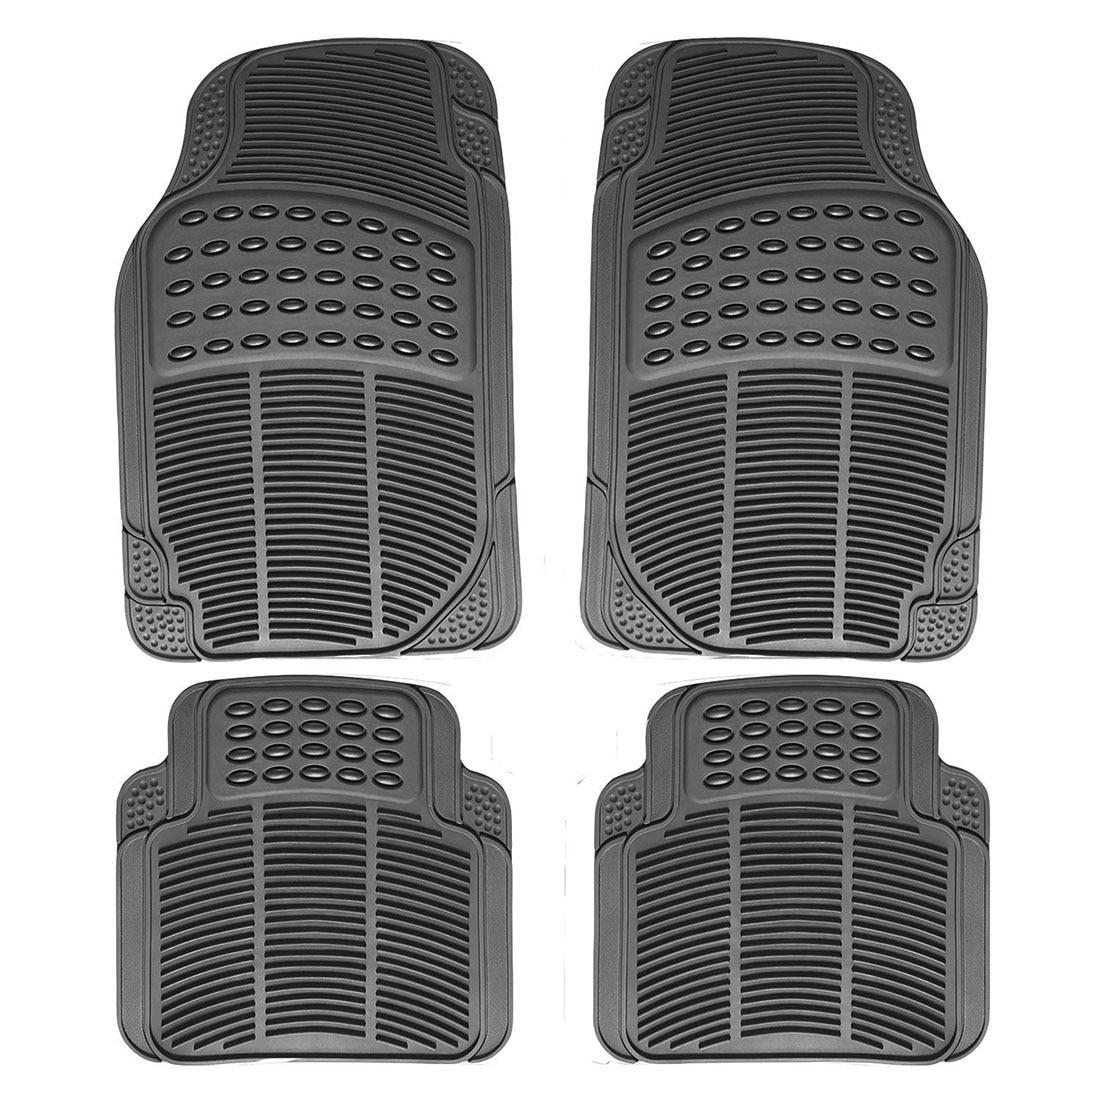 Infiniti qx60 rubber floor mats - Multi Season Rubber Floor Mats 4pc Set Black Fit Most Cars Suvs Vans And